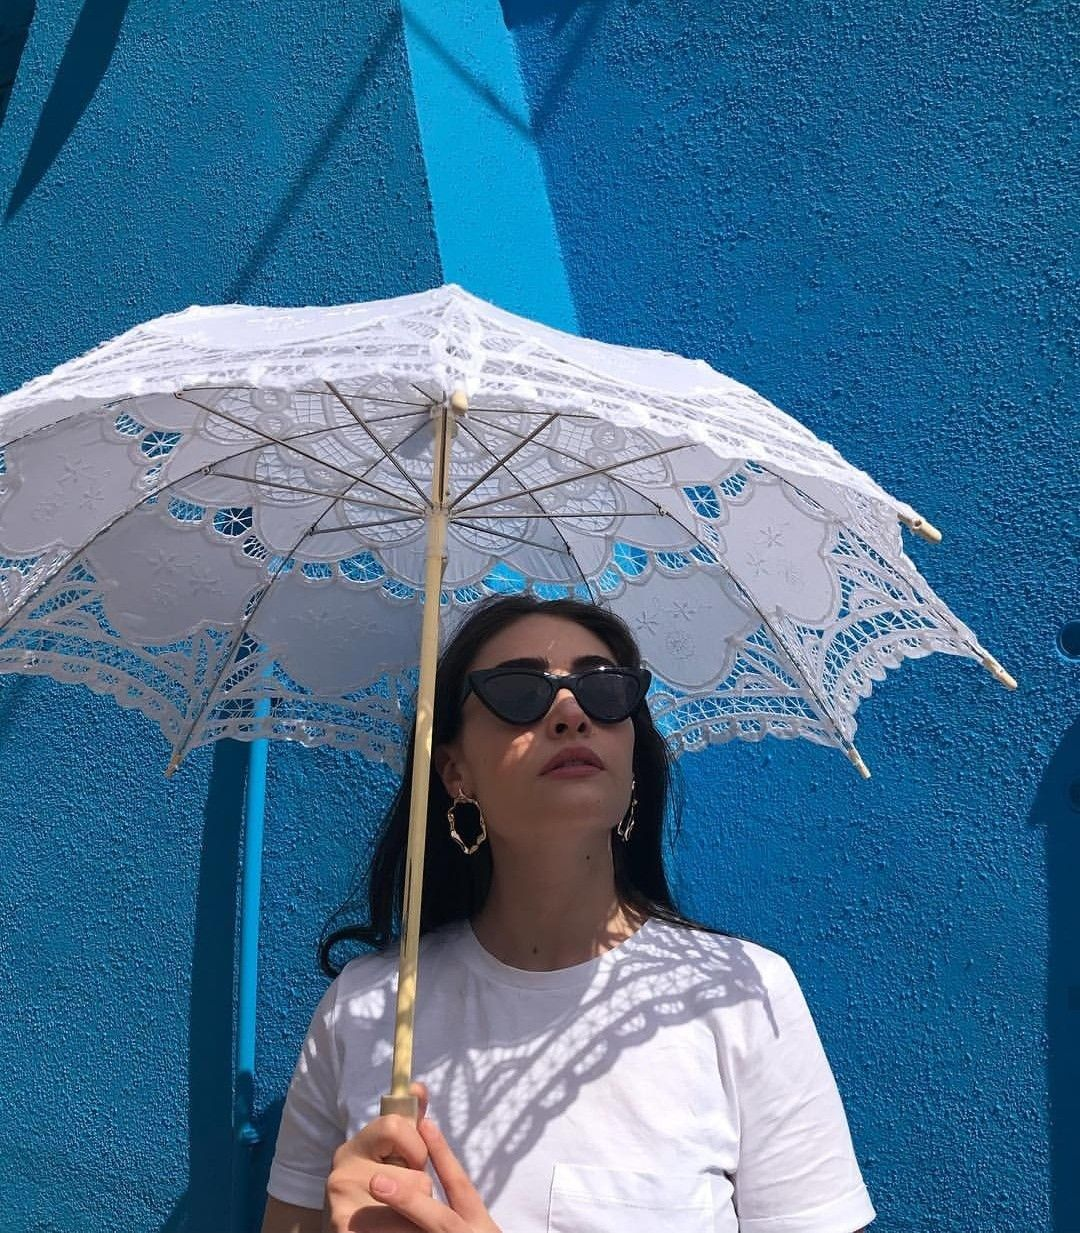 Esra Bilgiç (With images) Esra bilgic, Aesthetic pastel